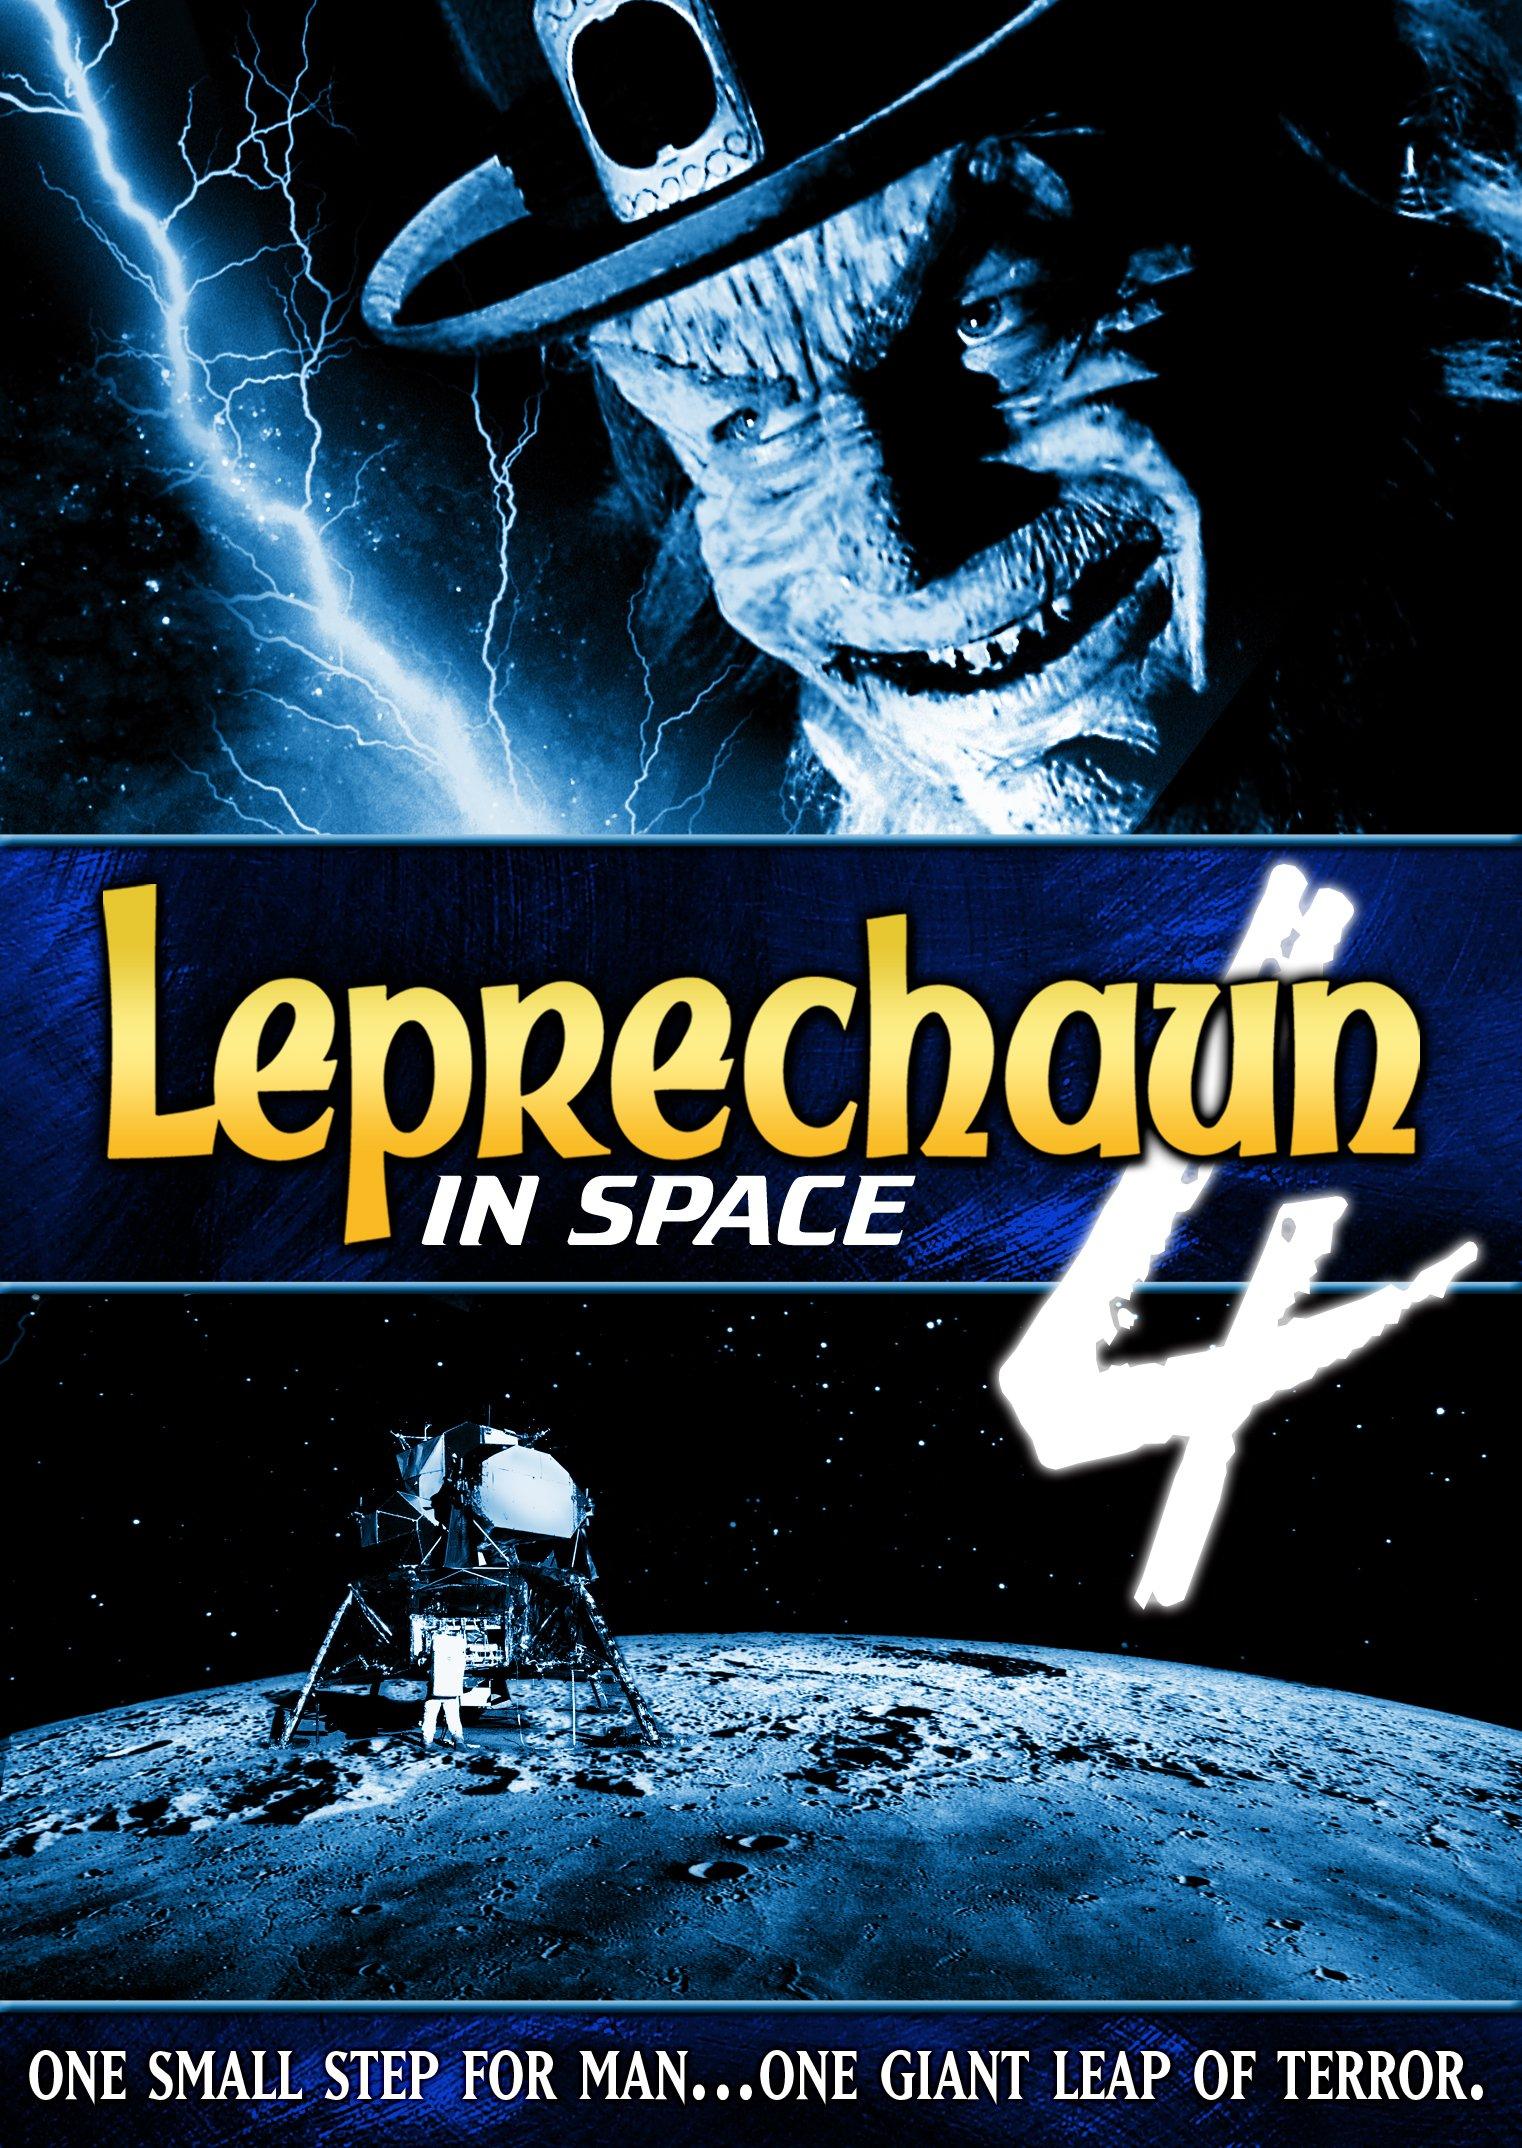 leprechaun 4 in space